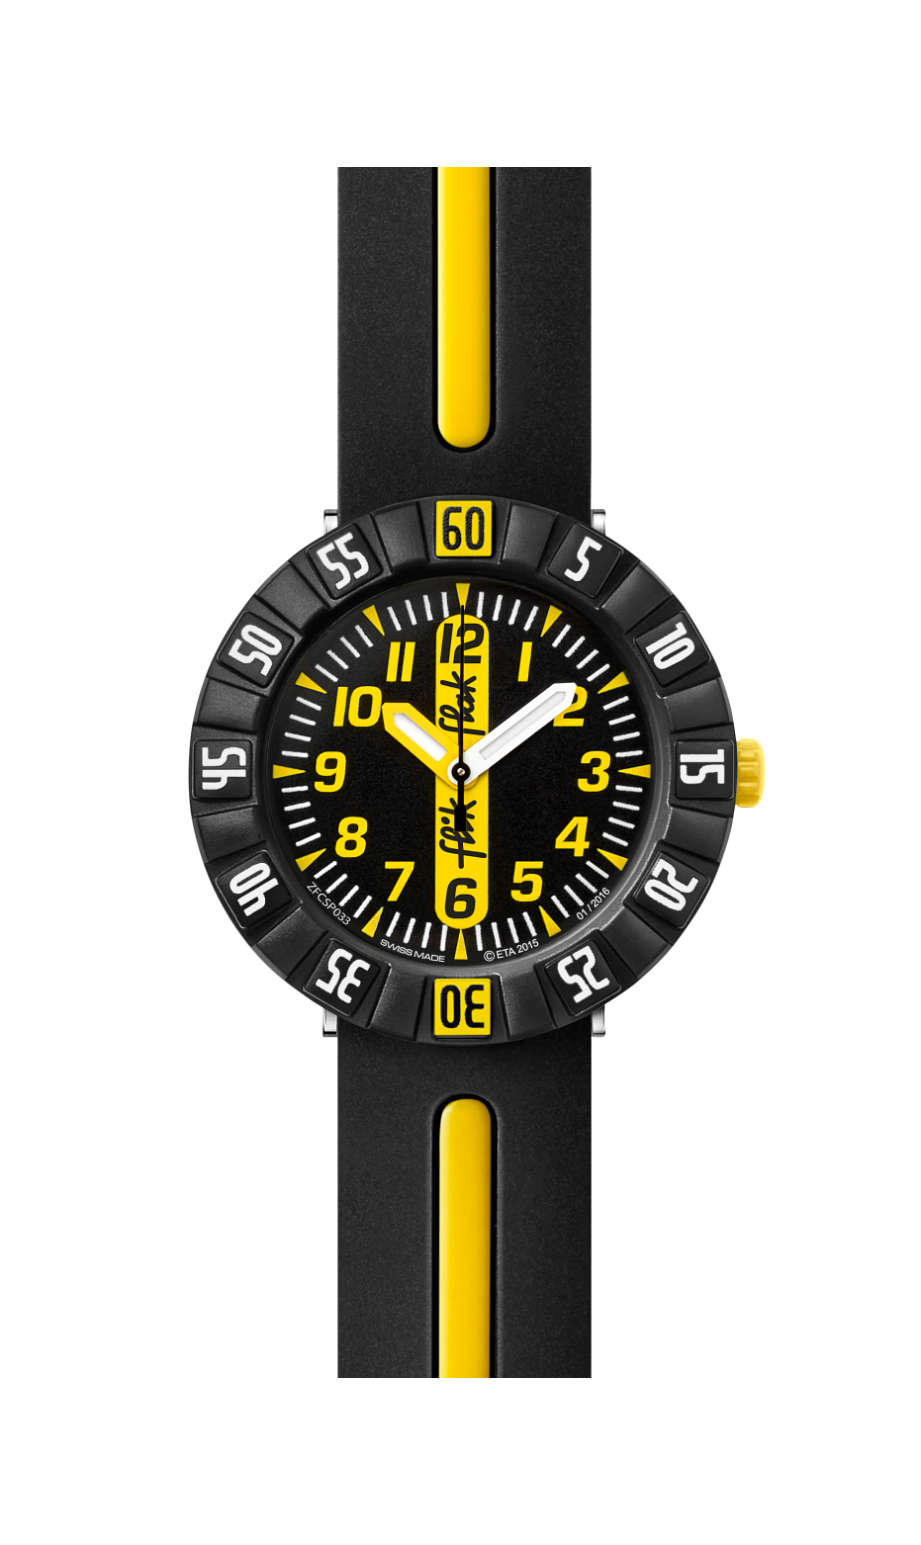 Swatch - YELLOW AHEAD - 1